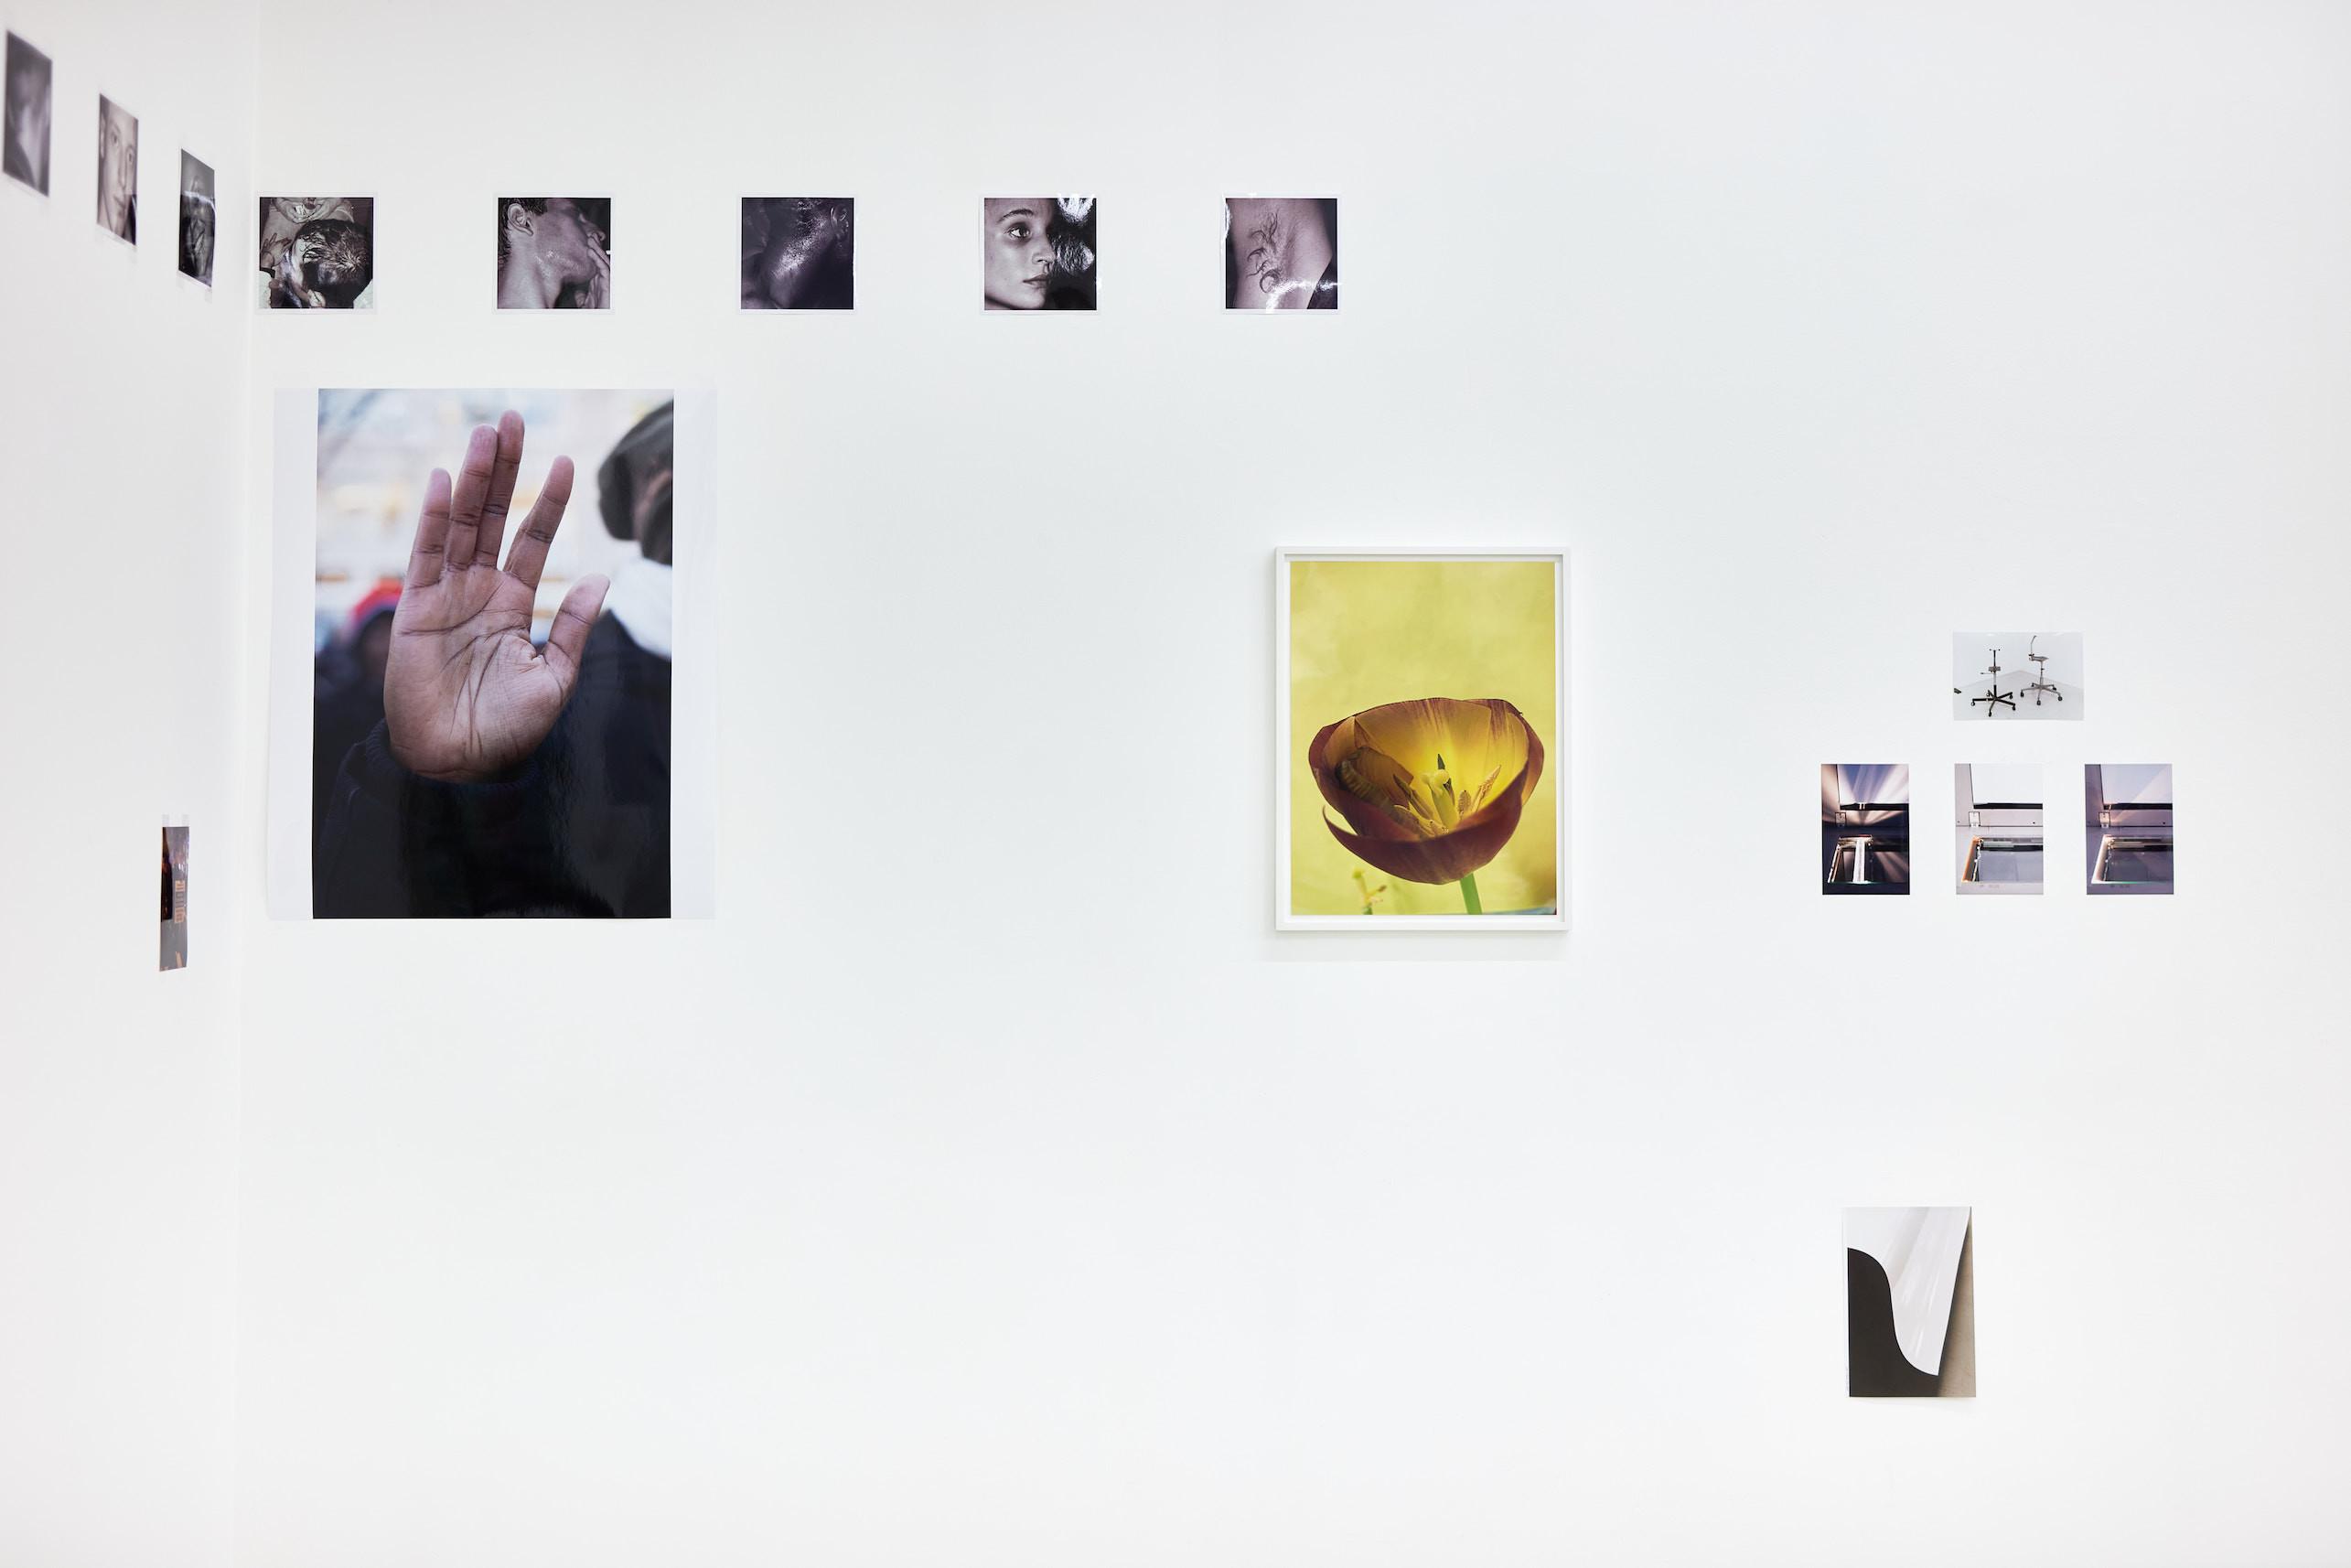 Wolfgang Tillmans: A te tested a tiéd . Kiállítási látkép, Trafó Galéria, 2021. Balra: Black Lives Matter protest, Union Square, b, 2014. Jobbra: Clipped Tulip, 2020. Fotó: Biró Dávid